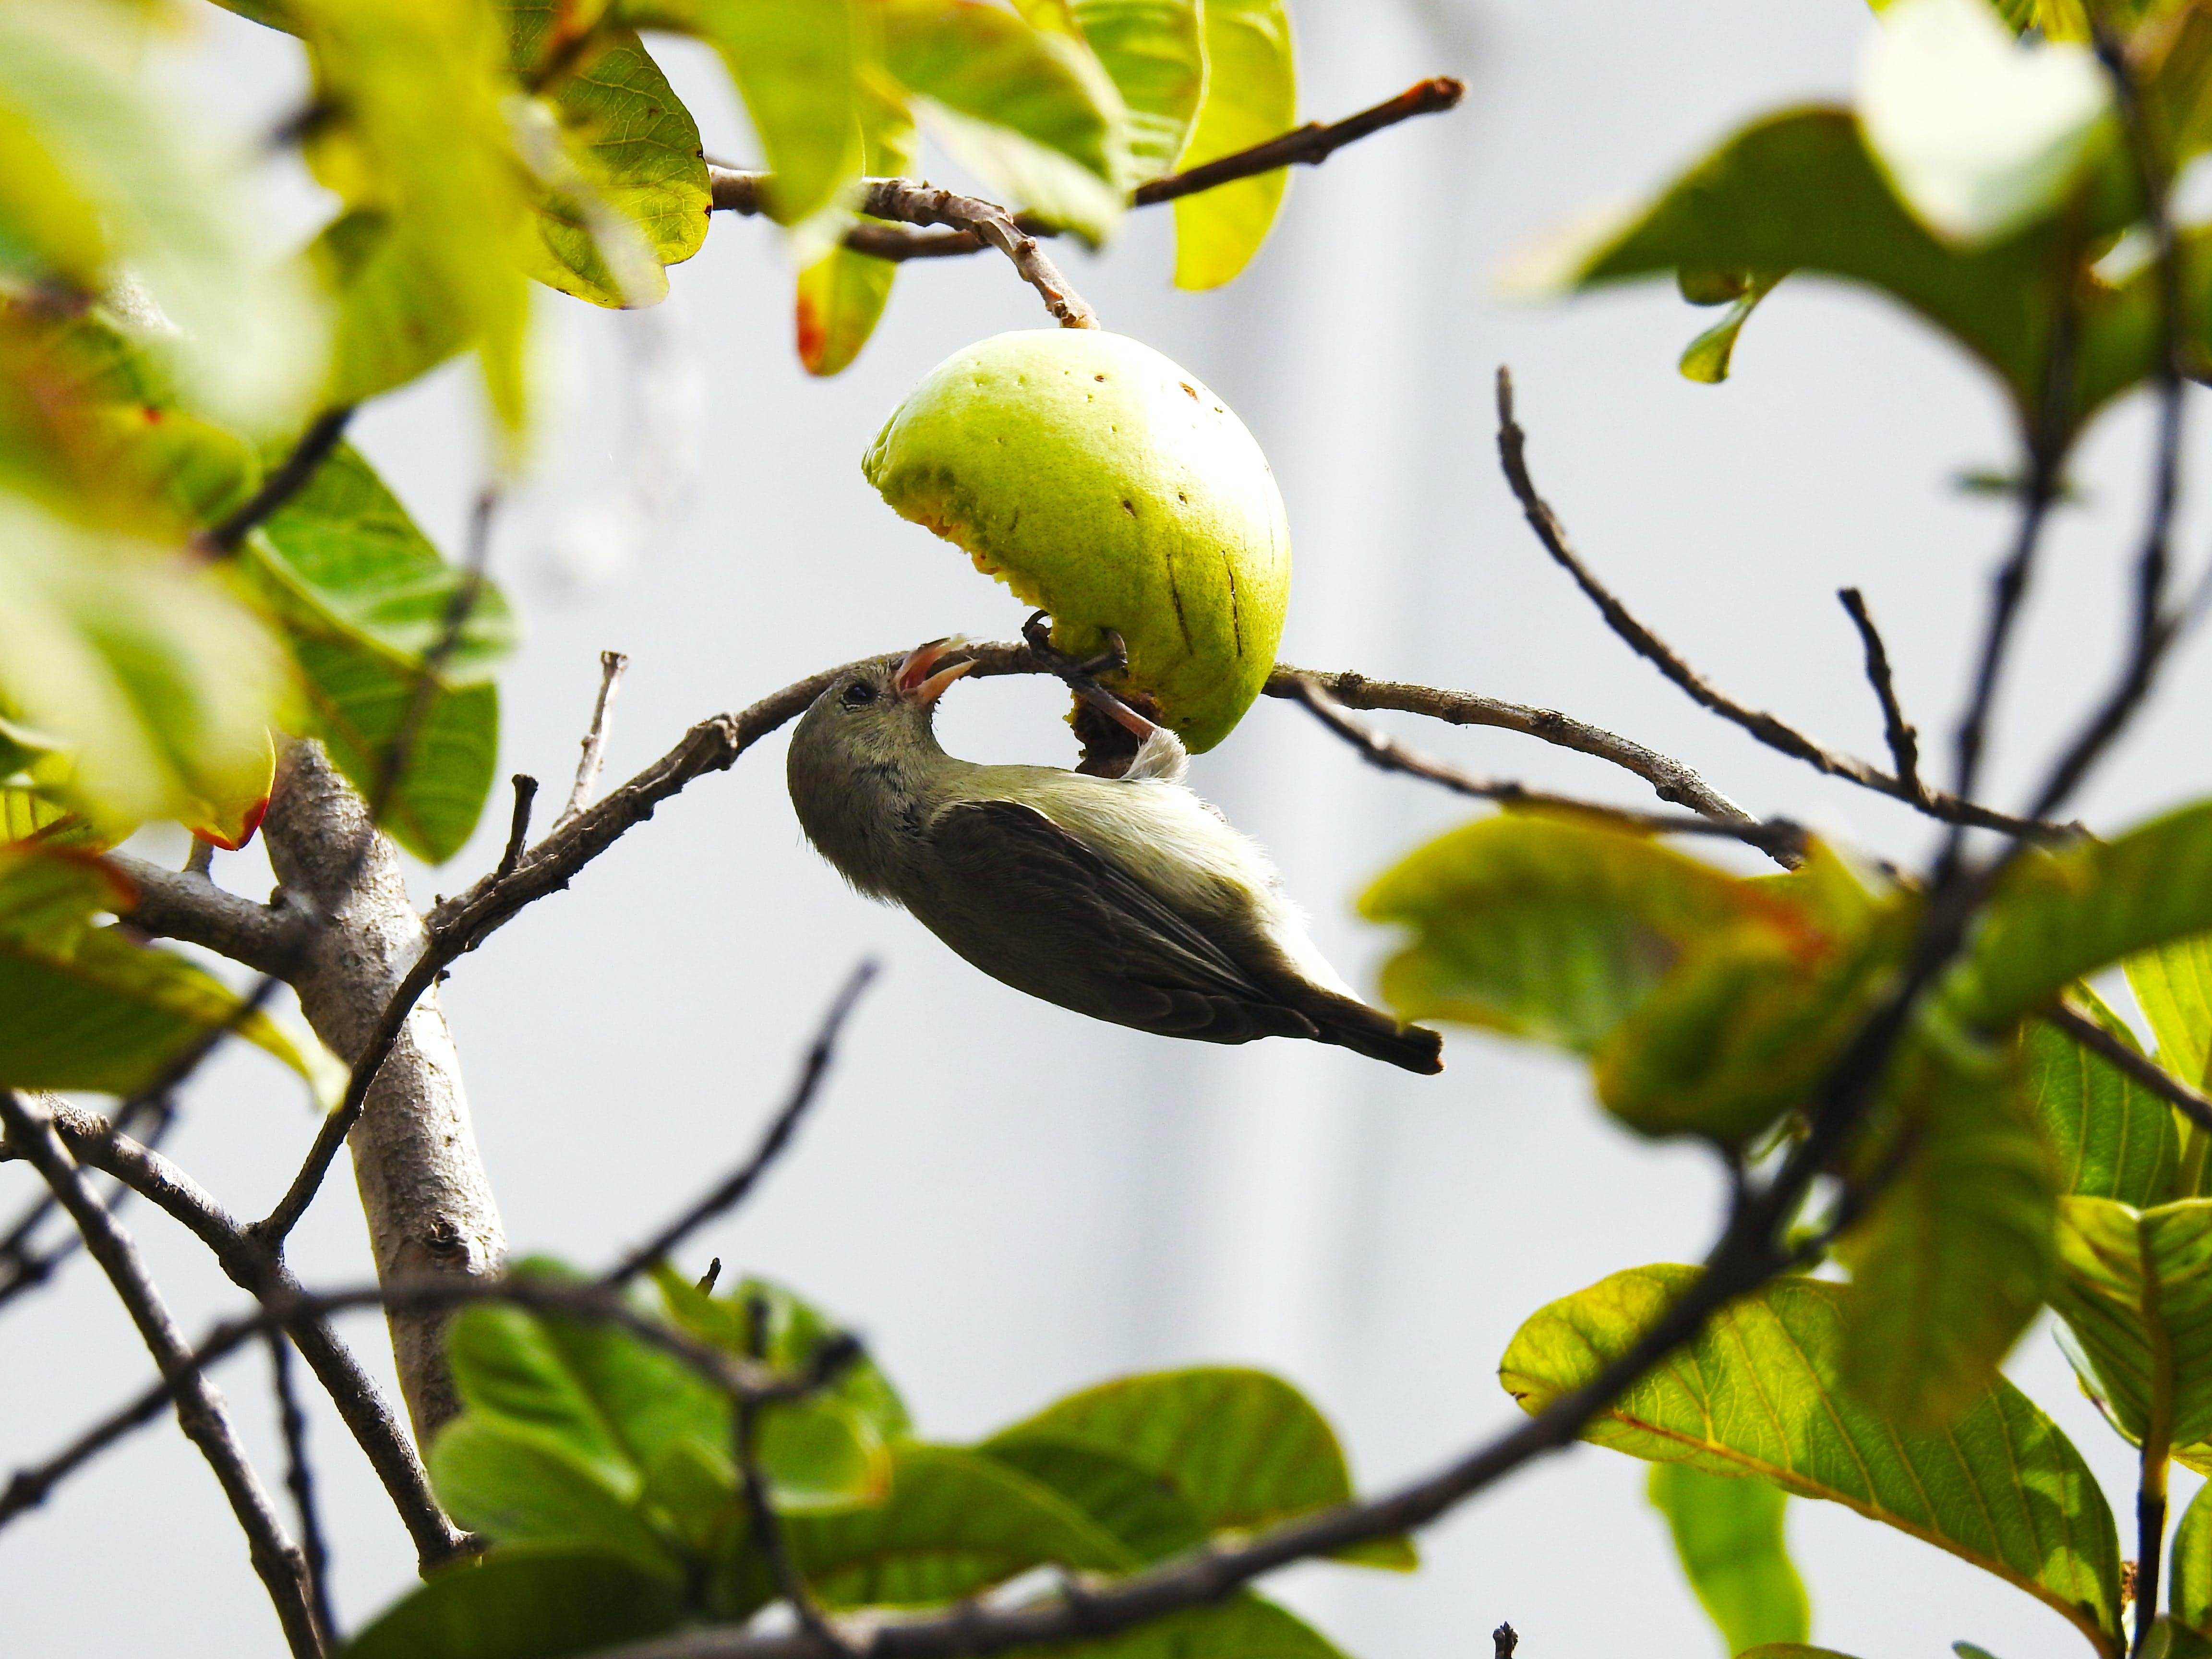 Bird Eating a Fruit